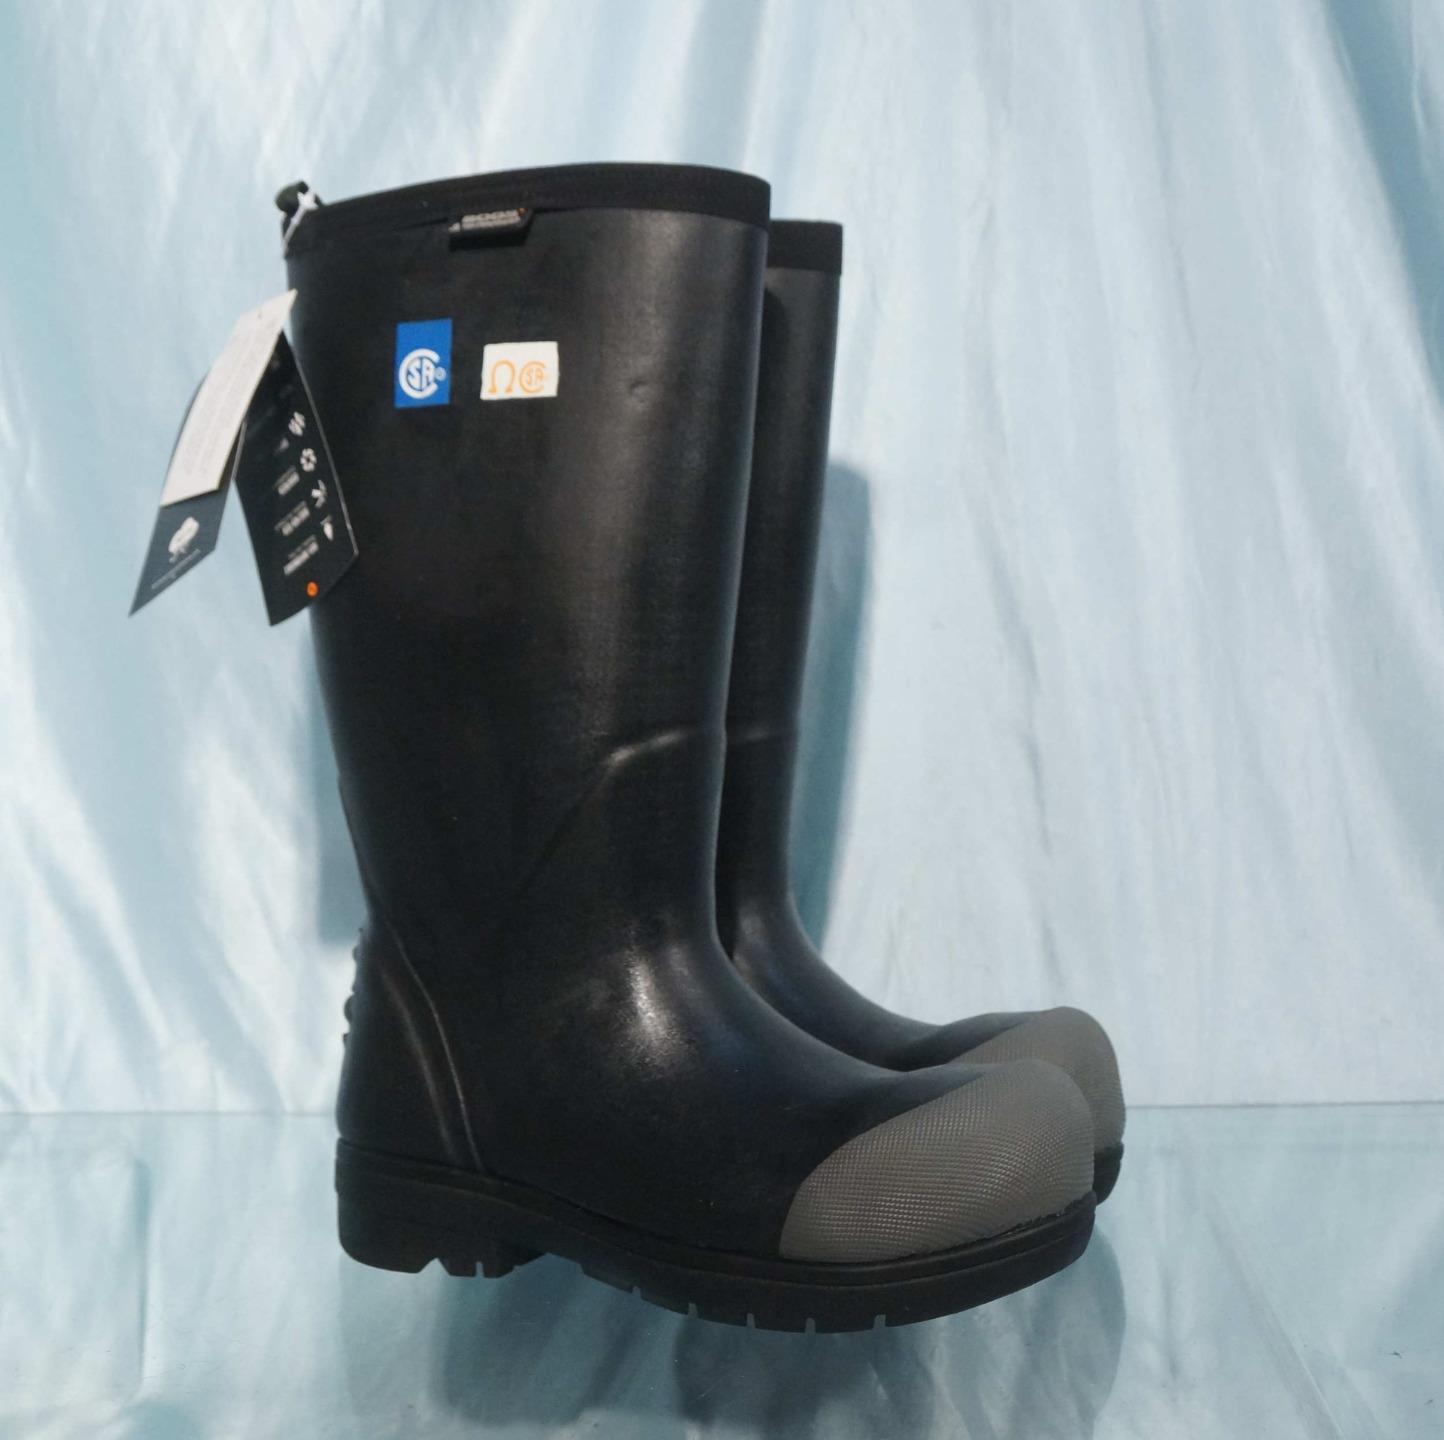 NWOB Black BOGS FOOD PRO ST Insulated Waterproof Steel Toe Dairy Muck Boots Sz 5